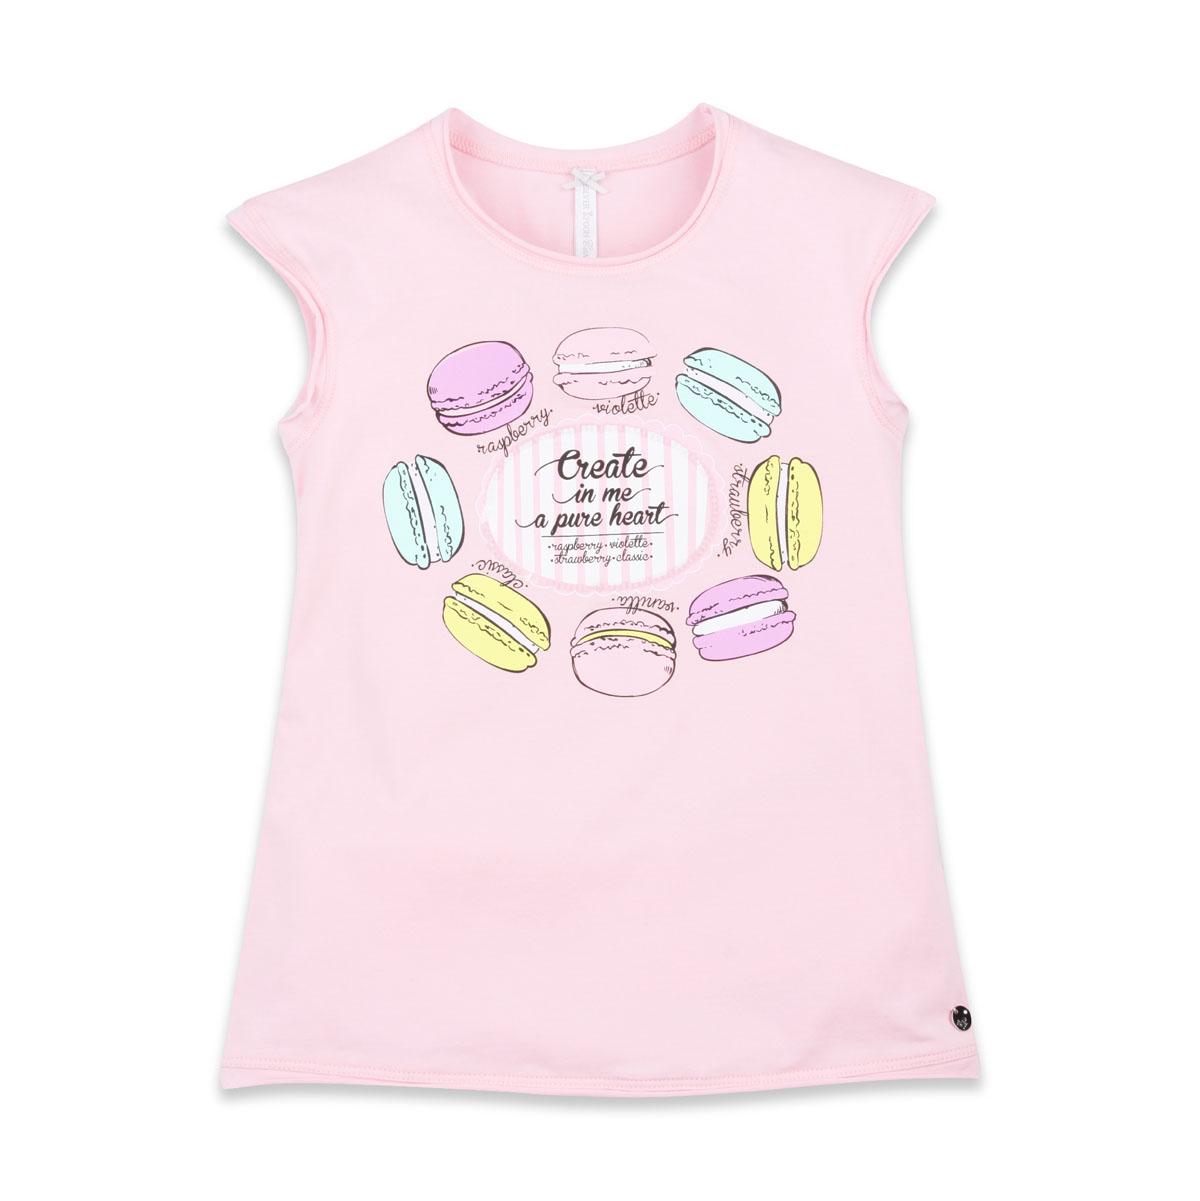 Футболка для девочек. SCFSG-628-24601-411 мод.F5-001SCFSG-628-24601-411 мод.F5-001